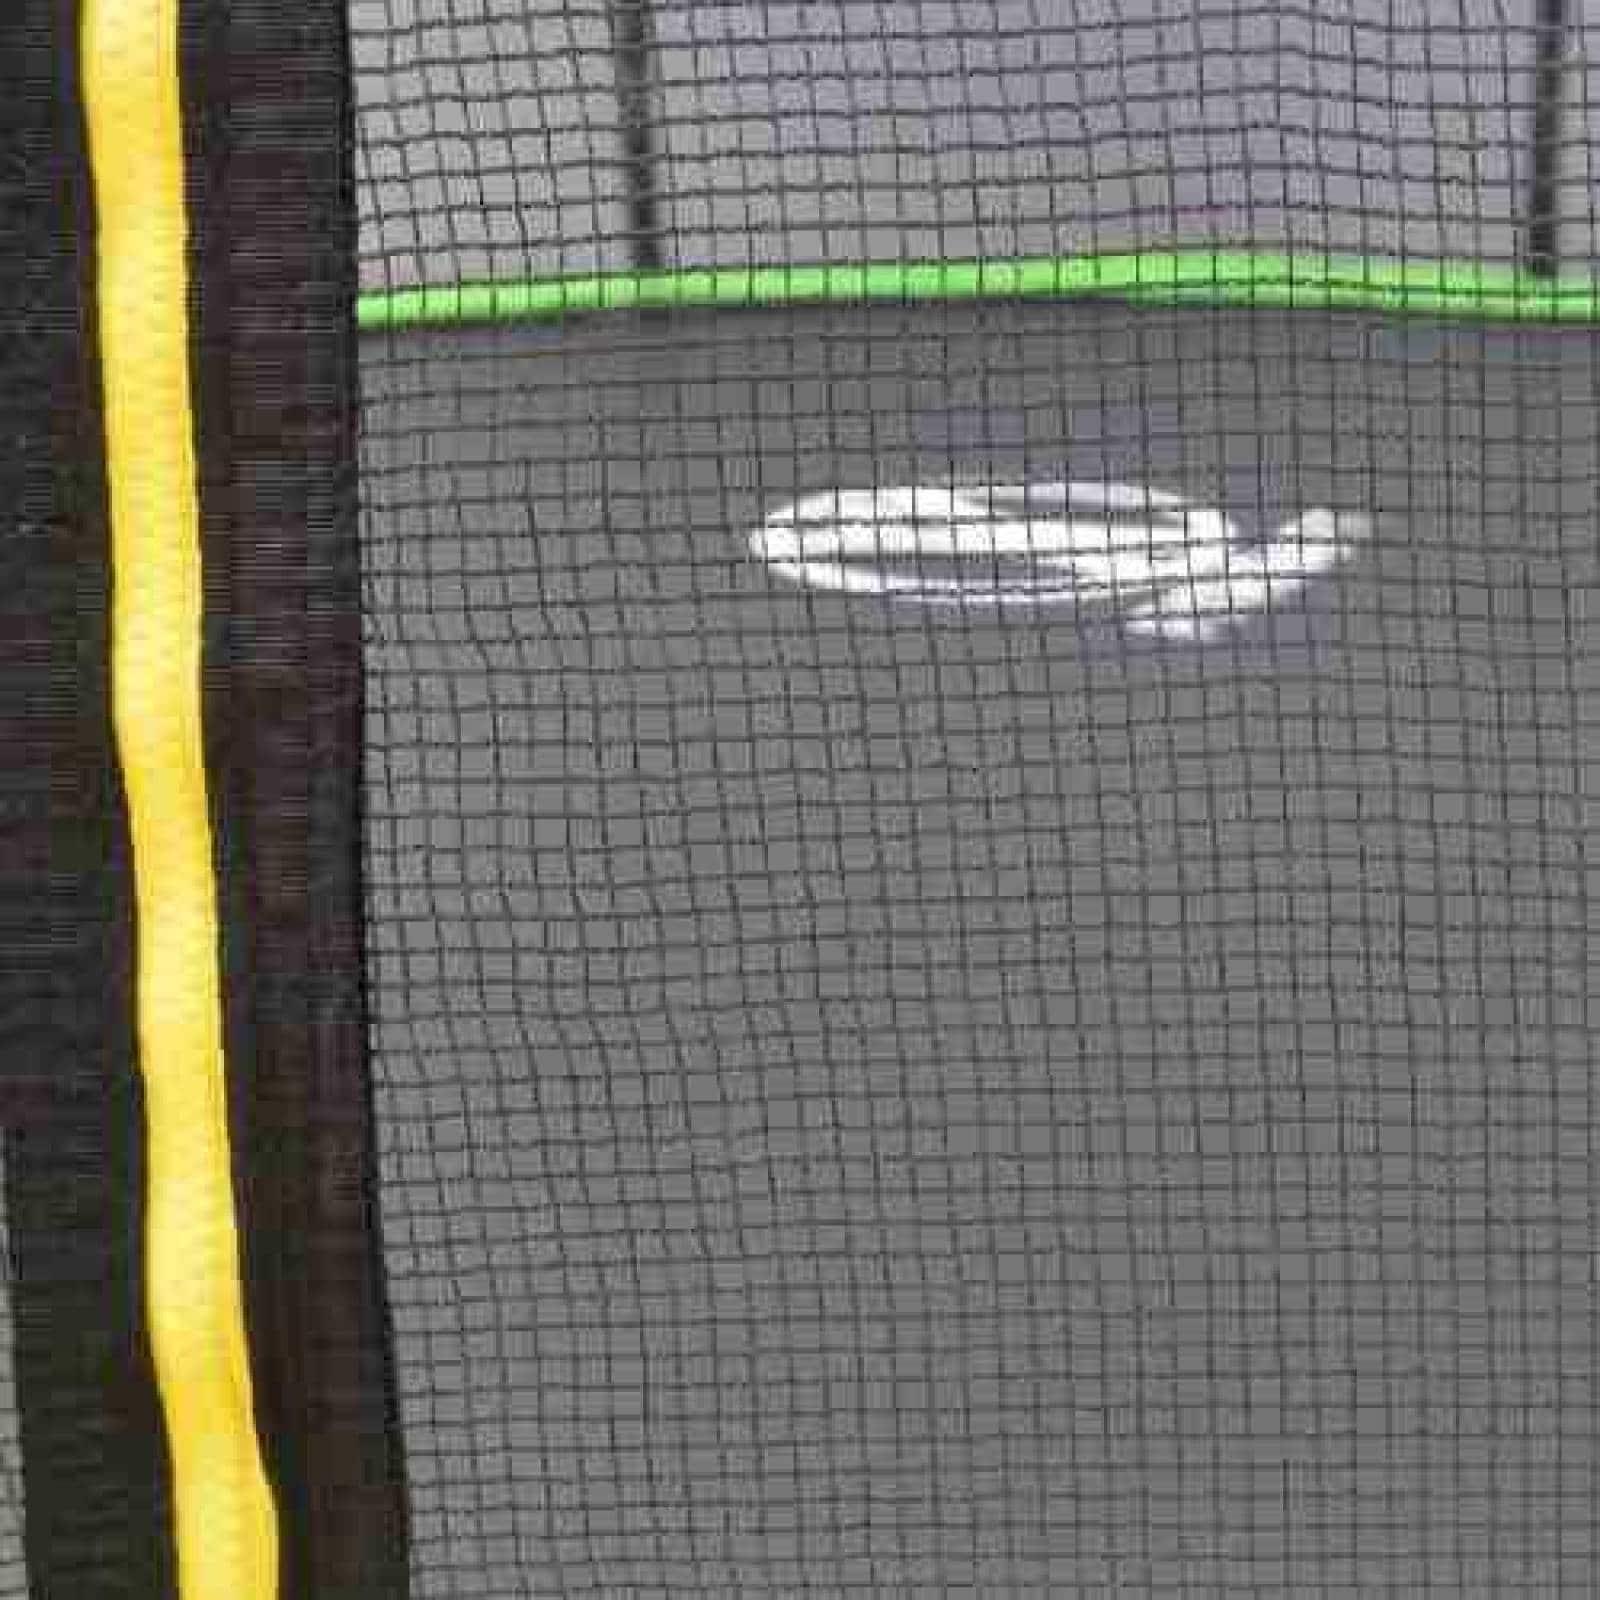 Trampolín Brincolín 12 Pies 365m Diámetro(CL) Verde